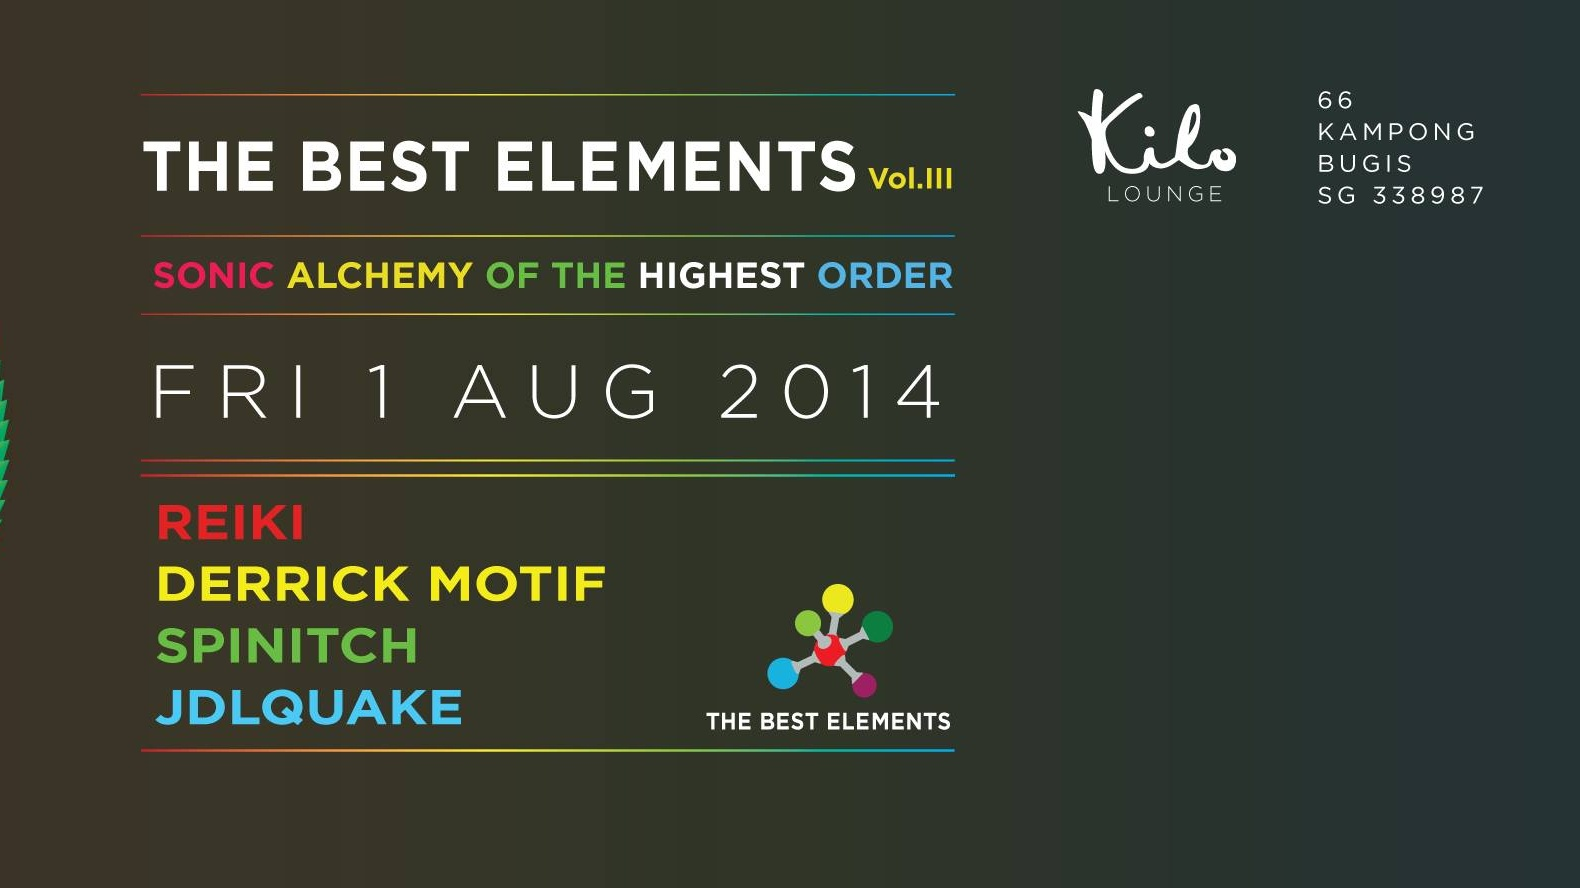 The Best Elements Vol III